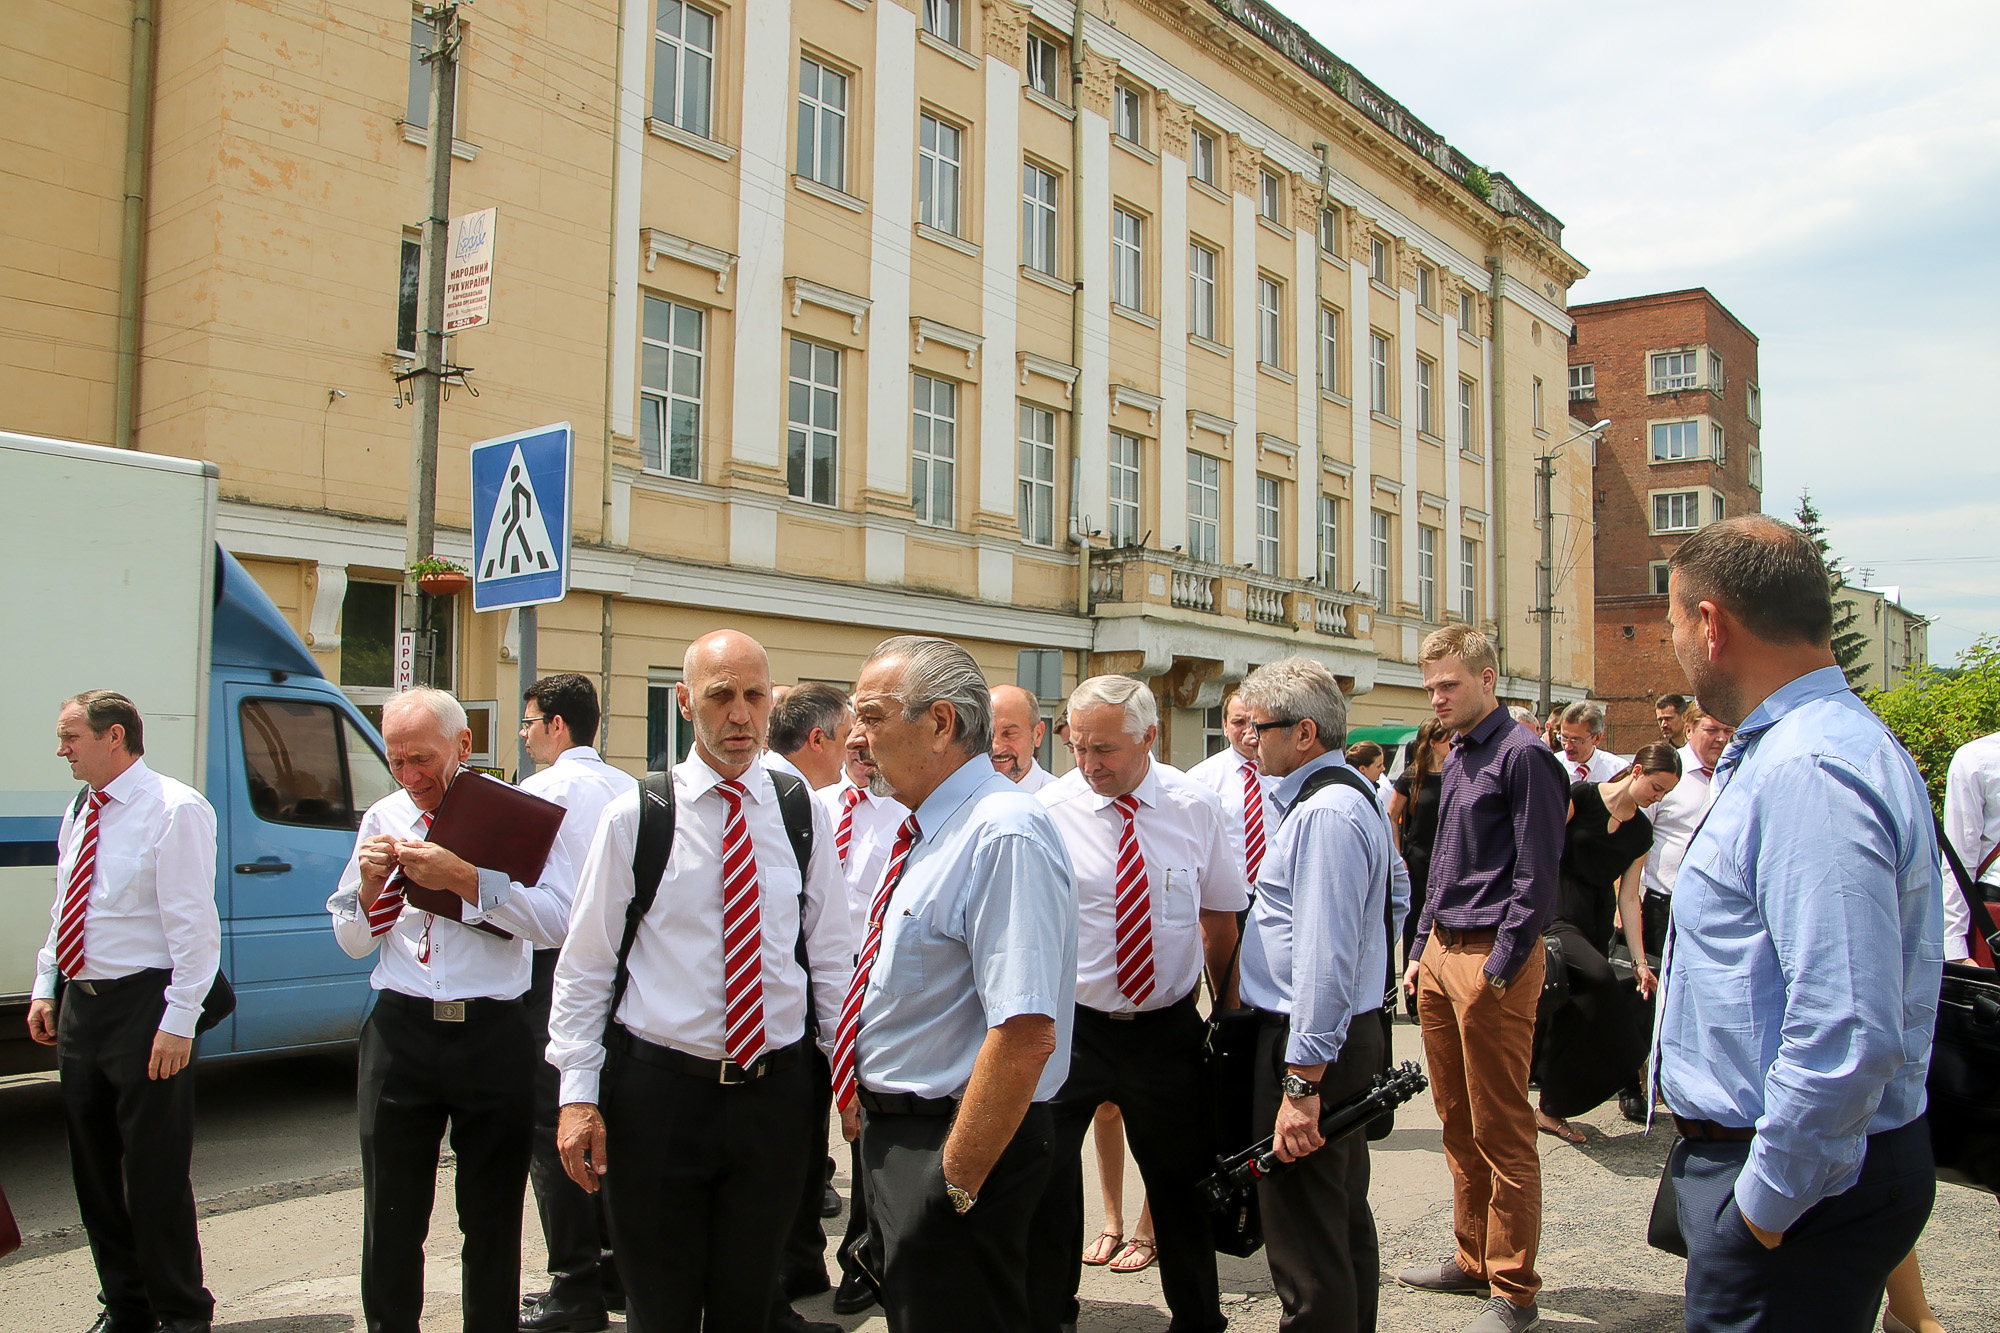 Männer unterhalten sich vor dem Kulturhaus in Borylsav.